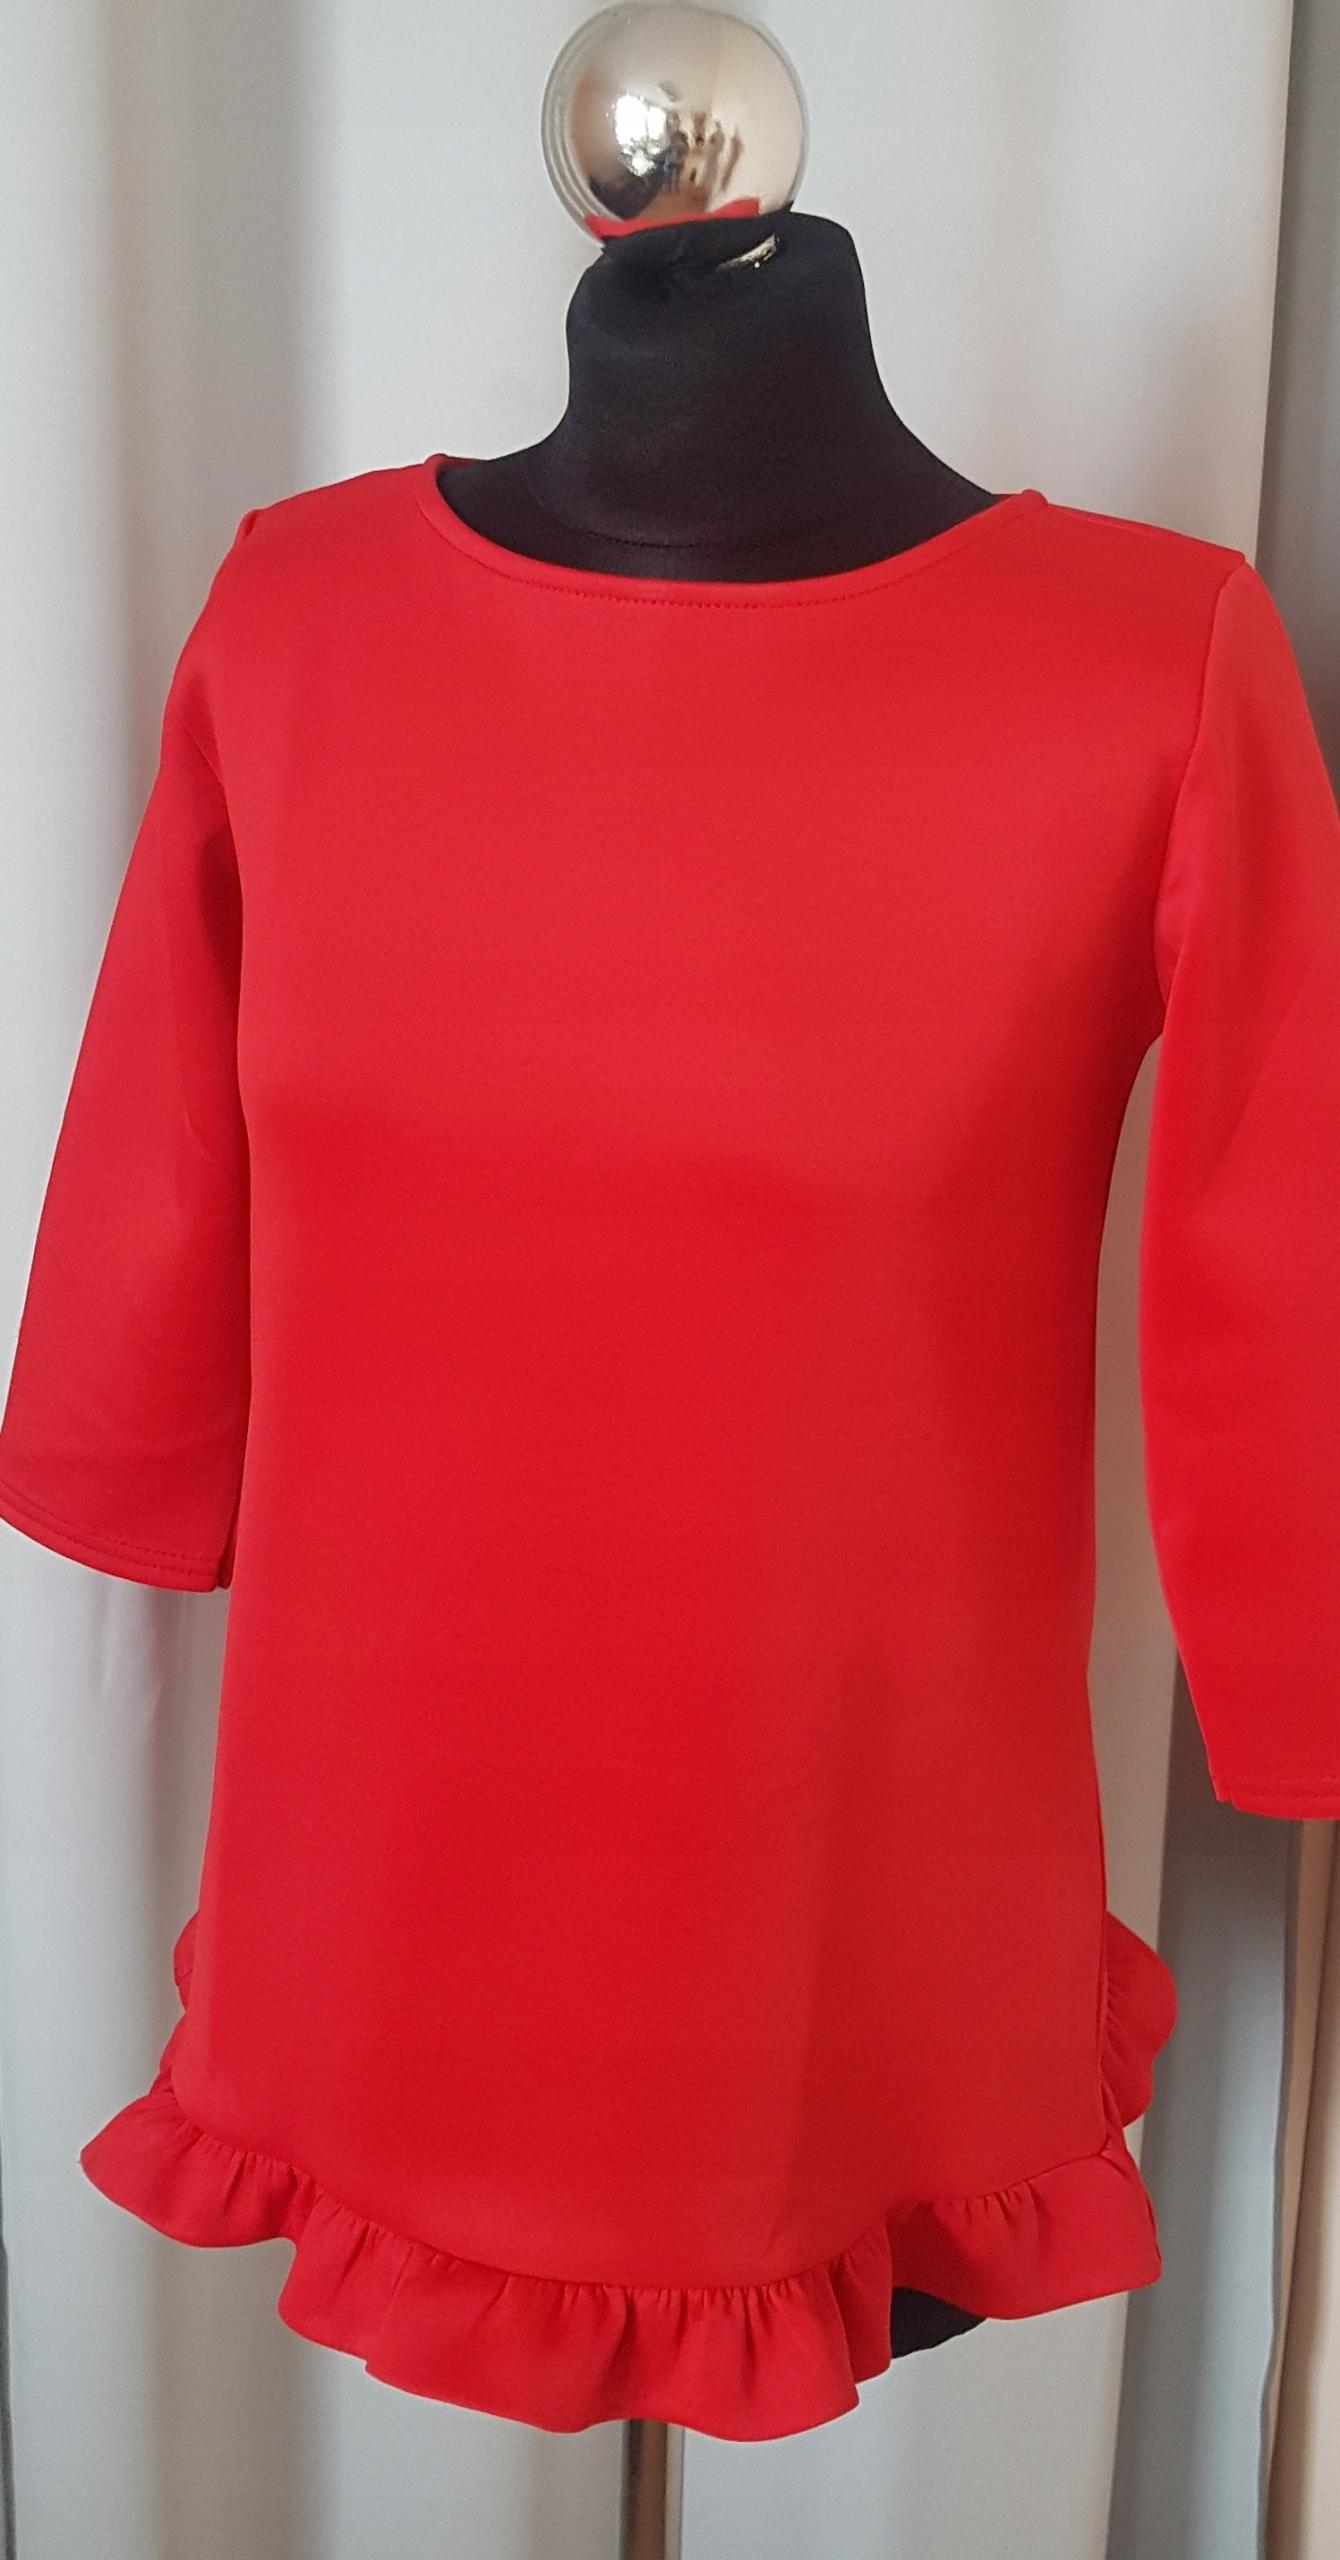 Bluza RESERVED 38 M czerwona oversize piękna